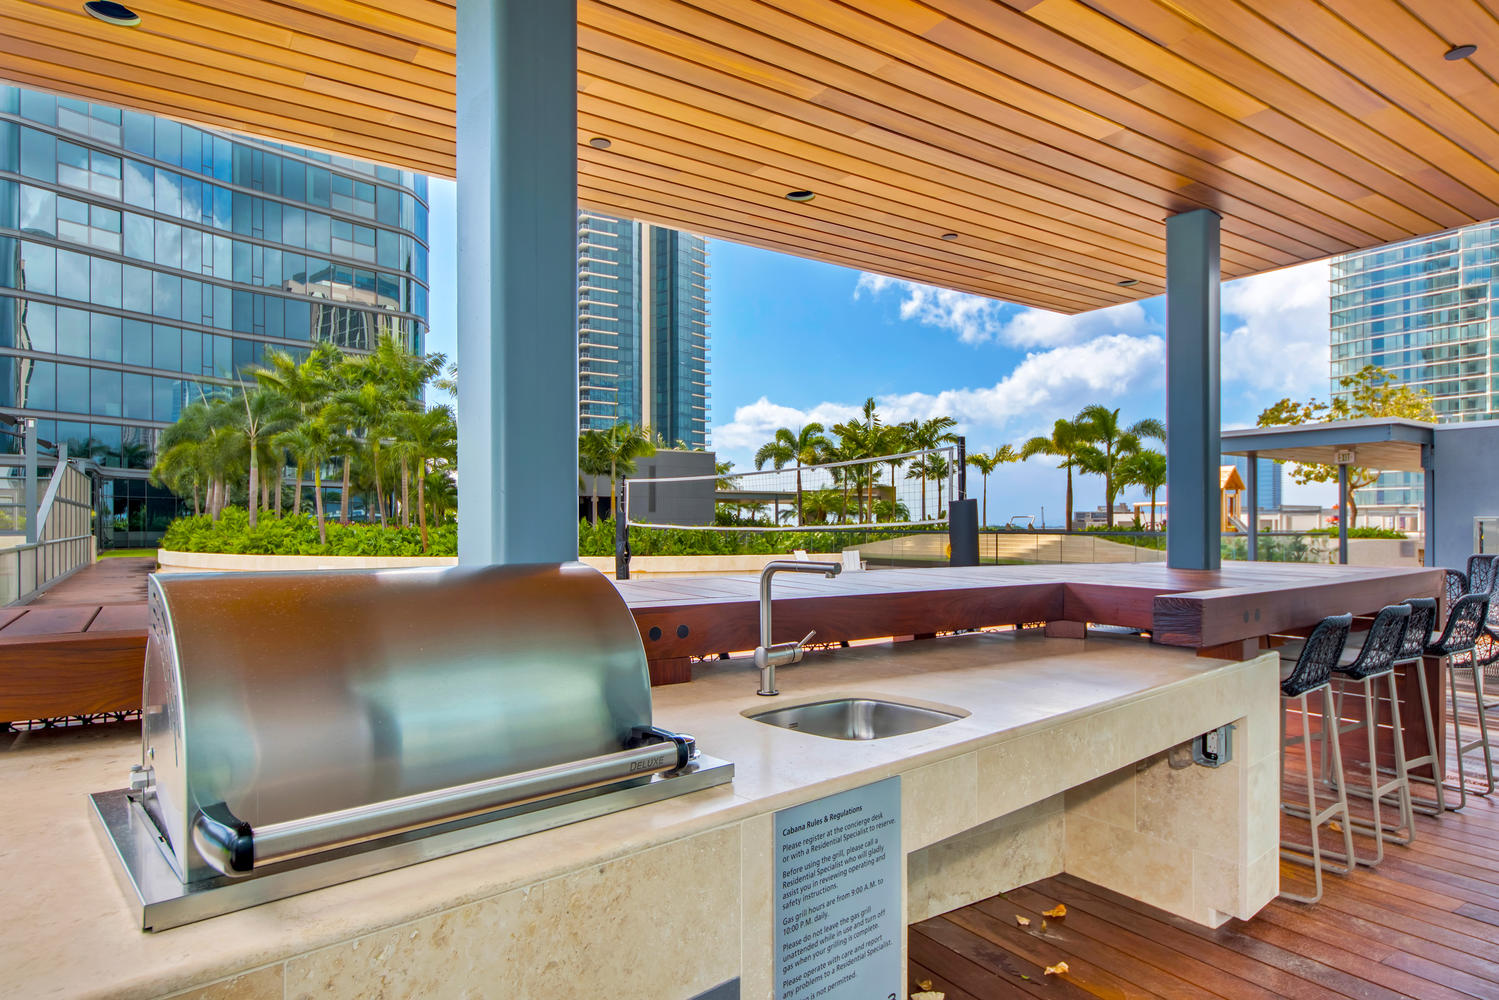 1108 Auahi St Honolulu HI-large-067-49-Auahi St Honolulu HI  96814 -1500x1000-72dpi.jpg